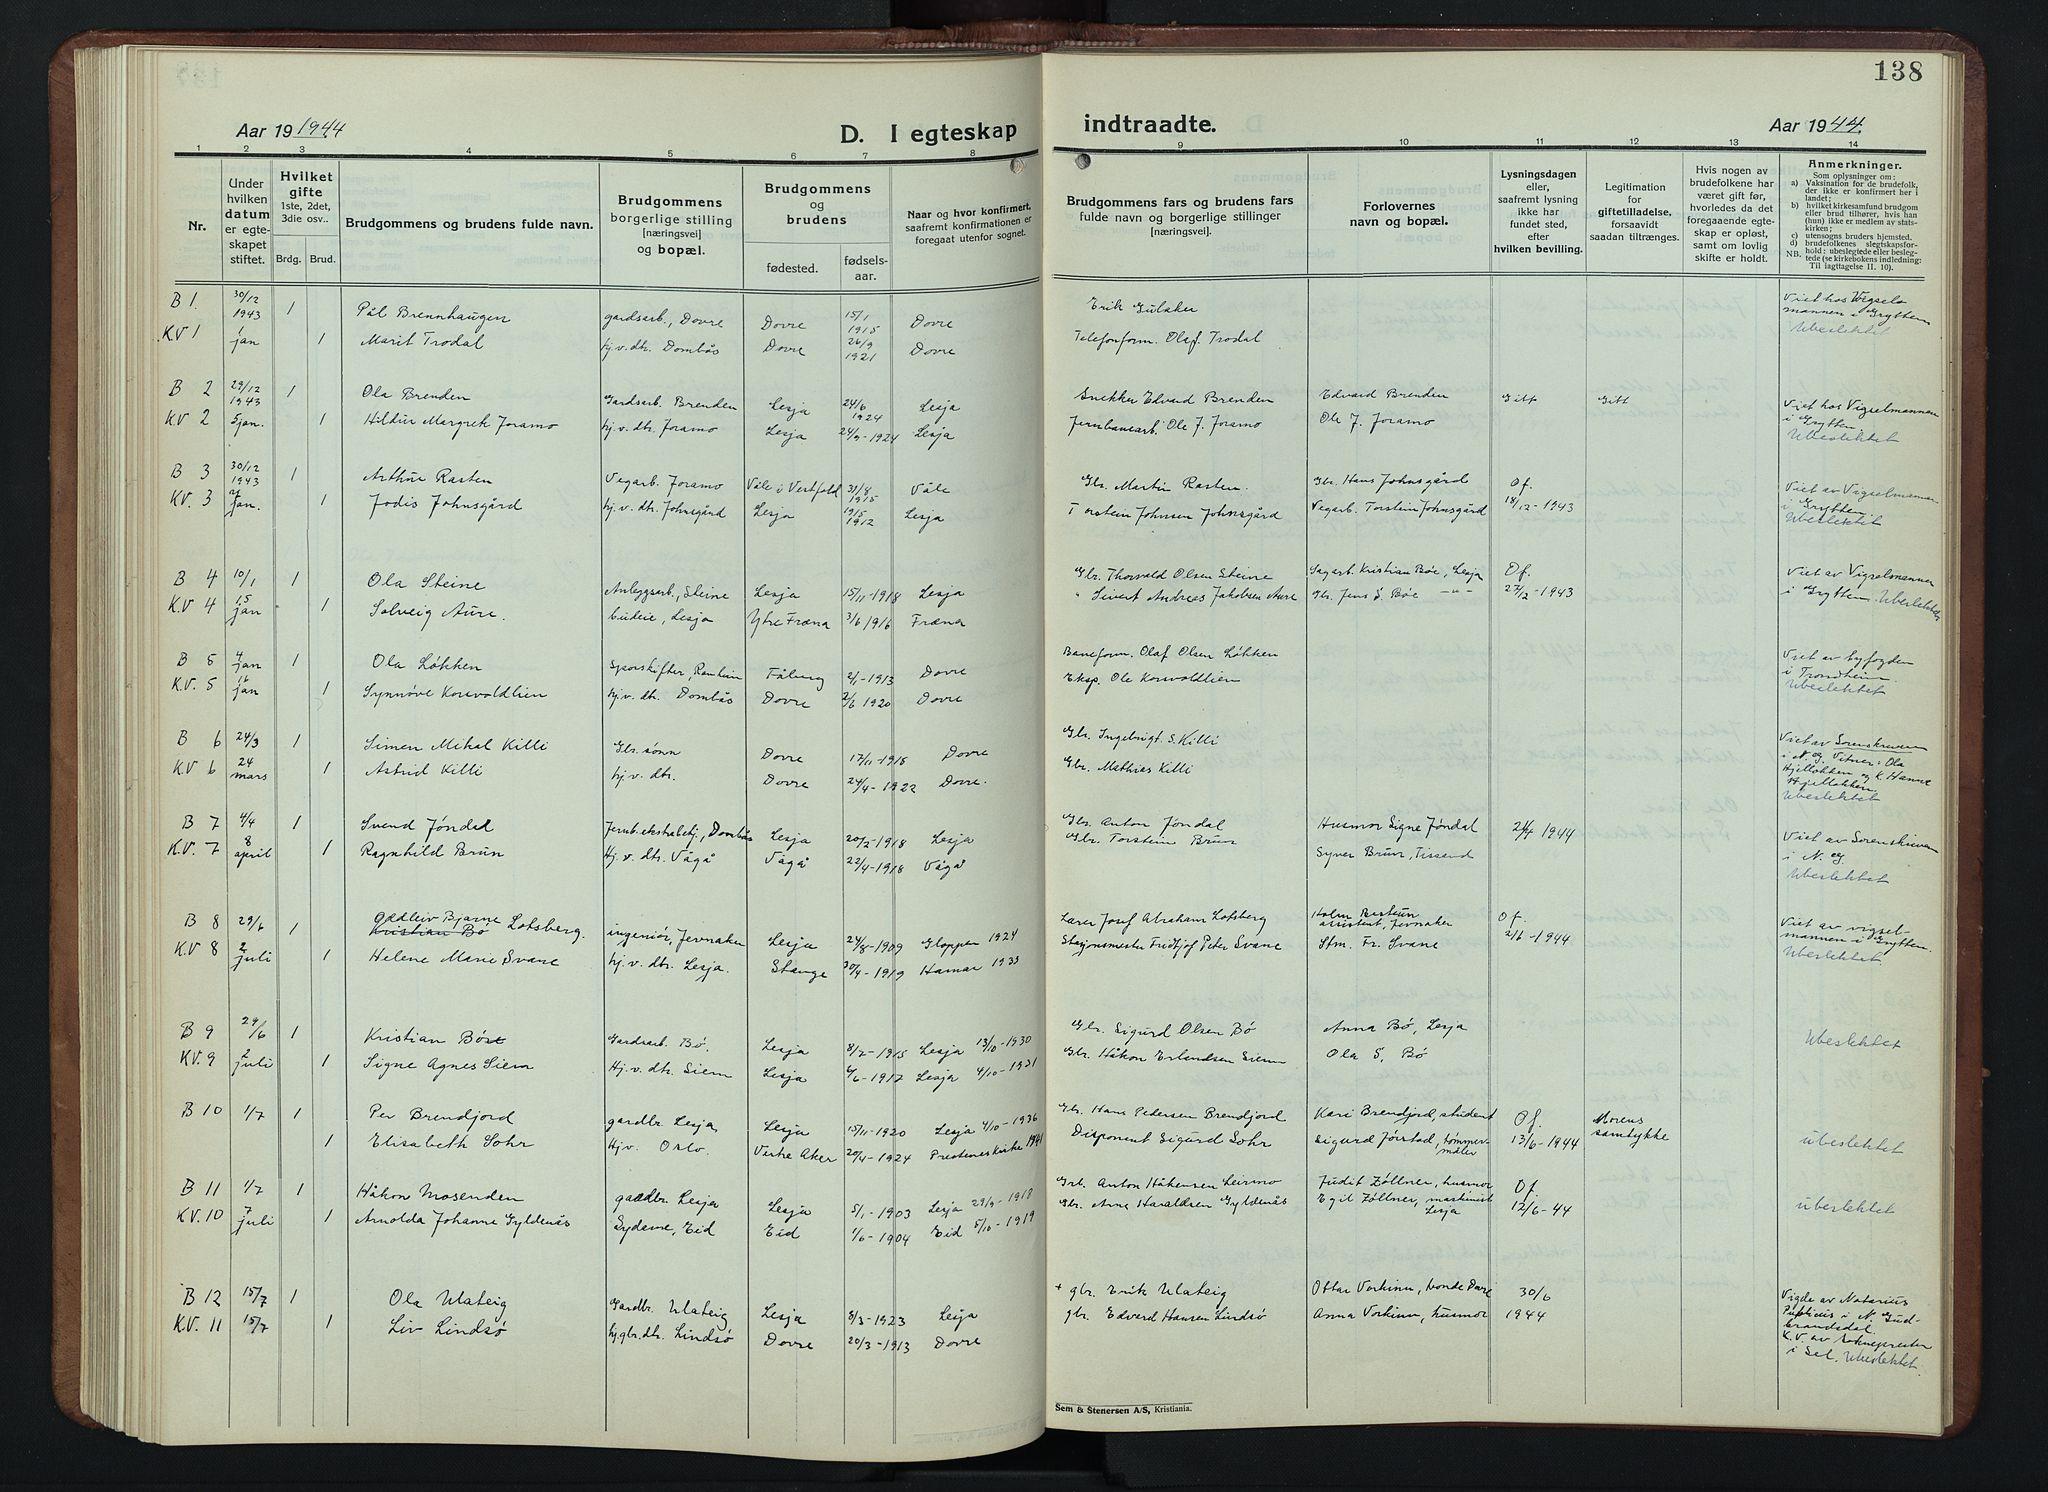 SAH, Lesja prestekontor, Klokkerbok nr. 9, 1924-1947, s. 138